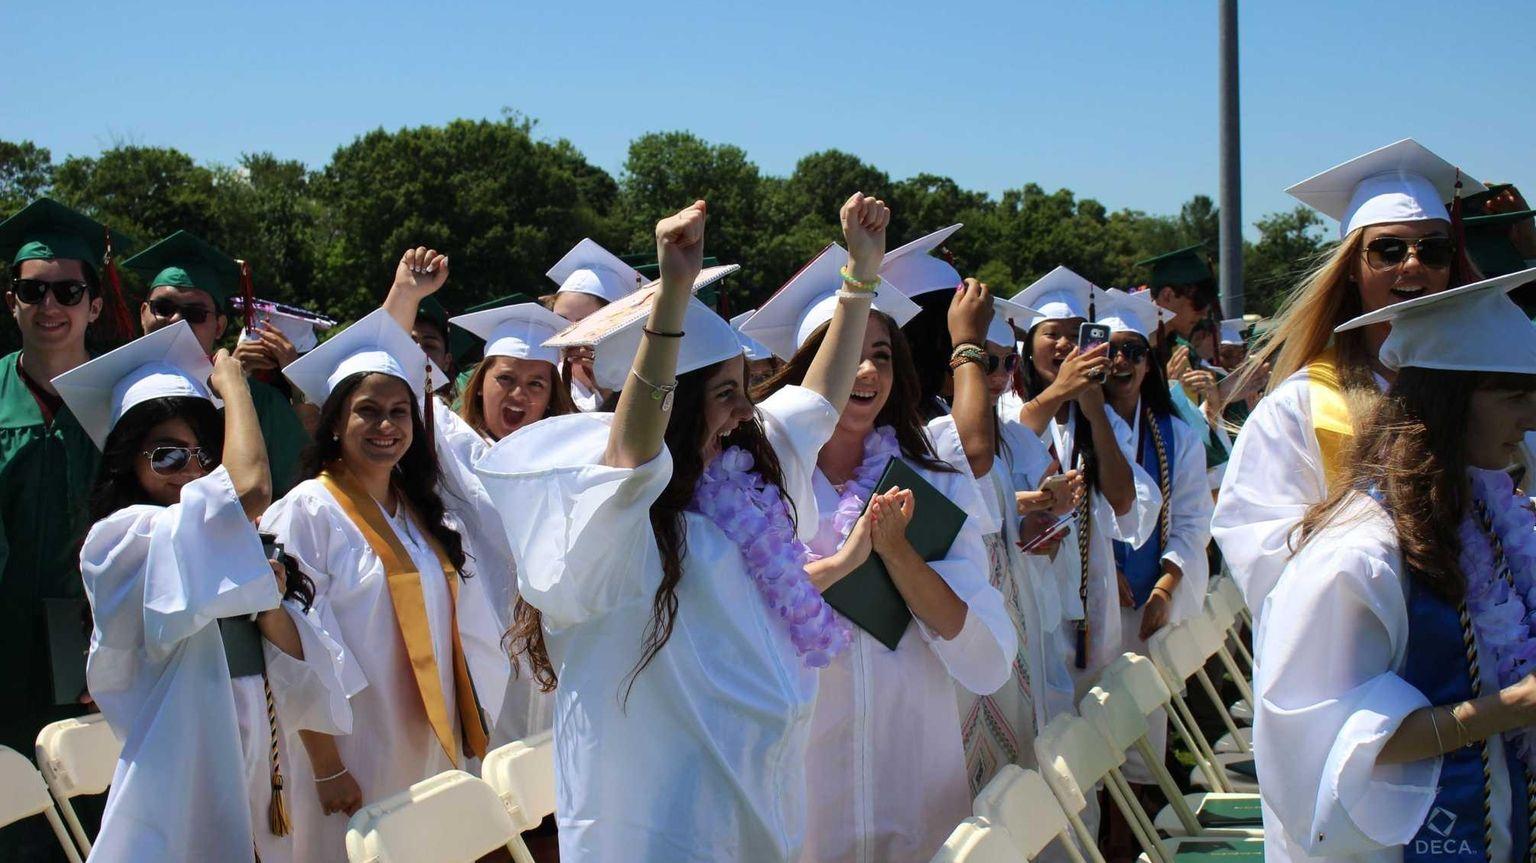 Long Island's Class of 2017